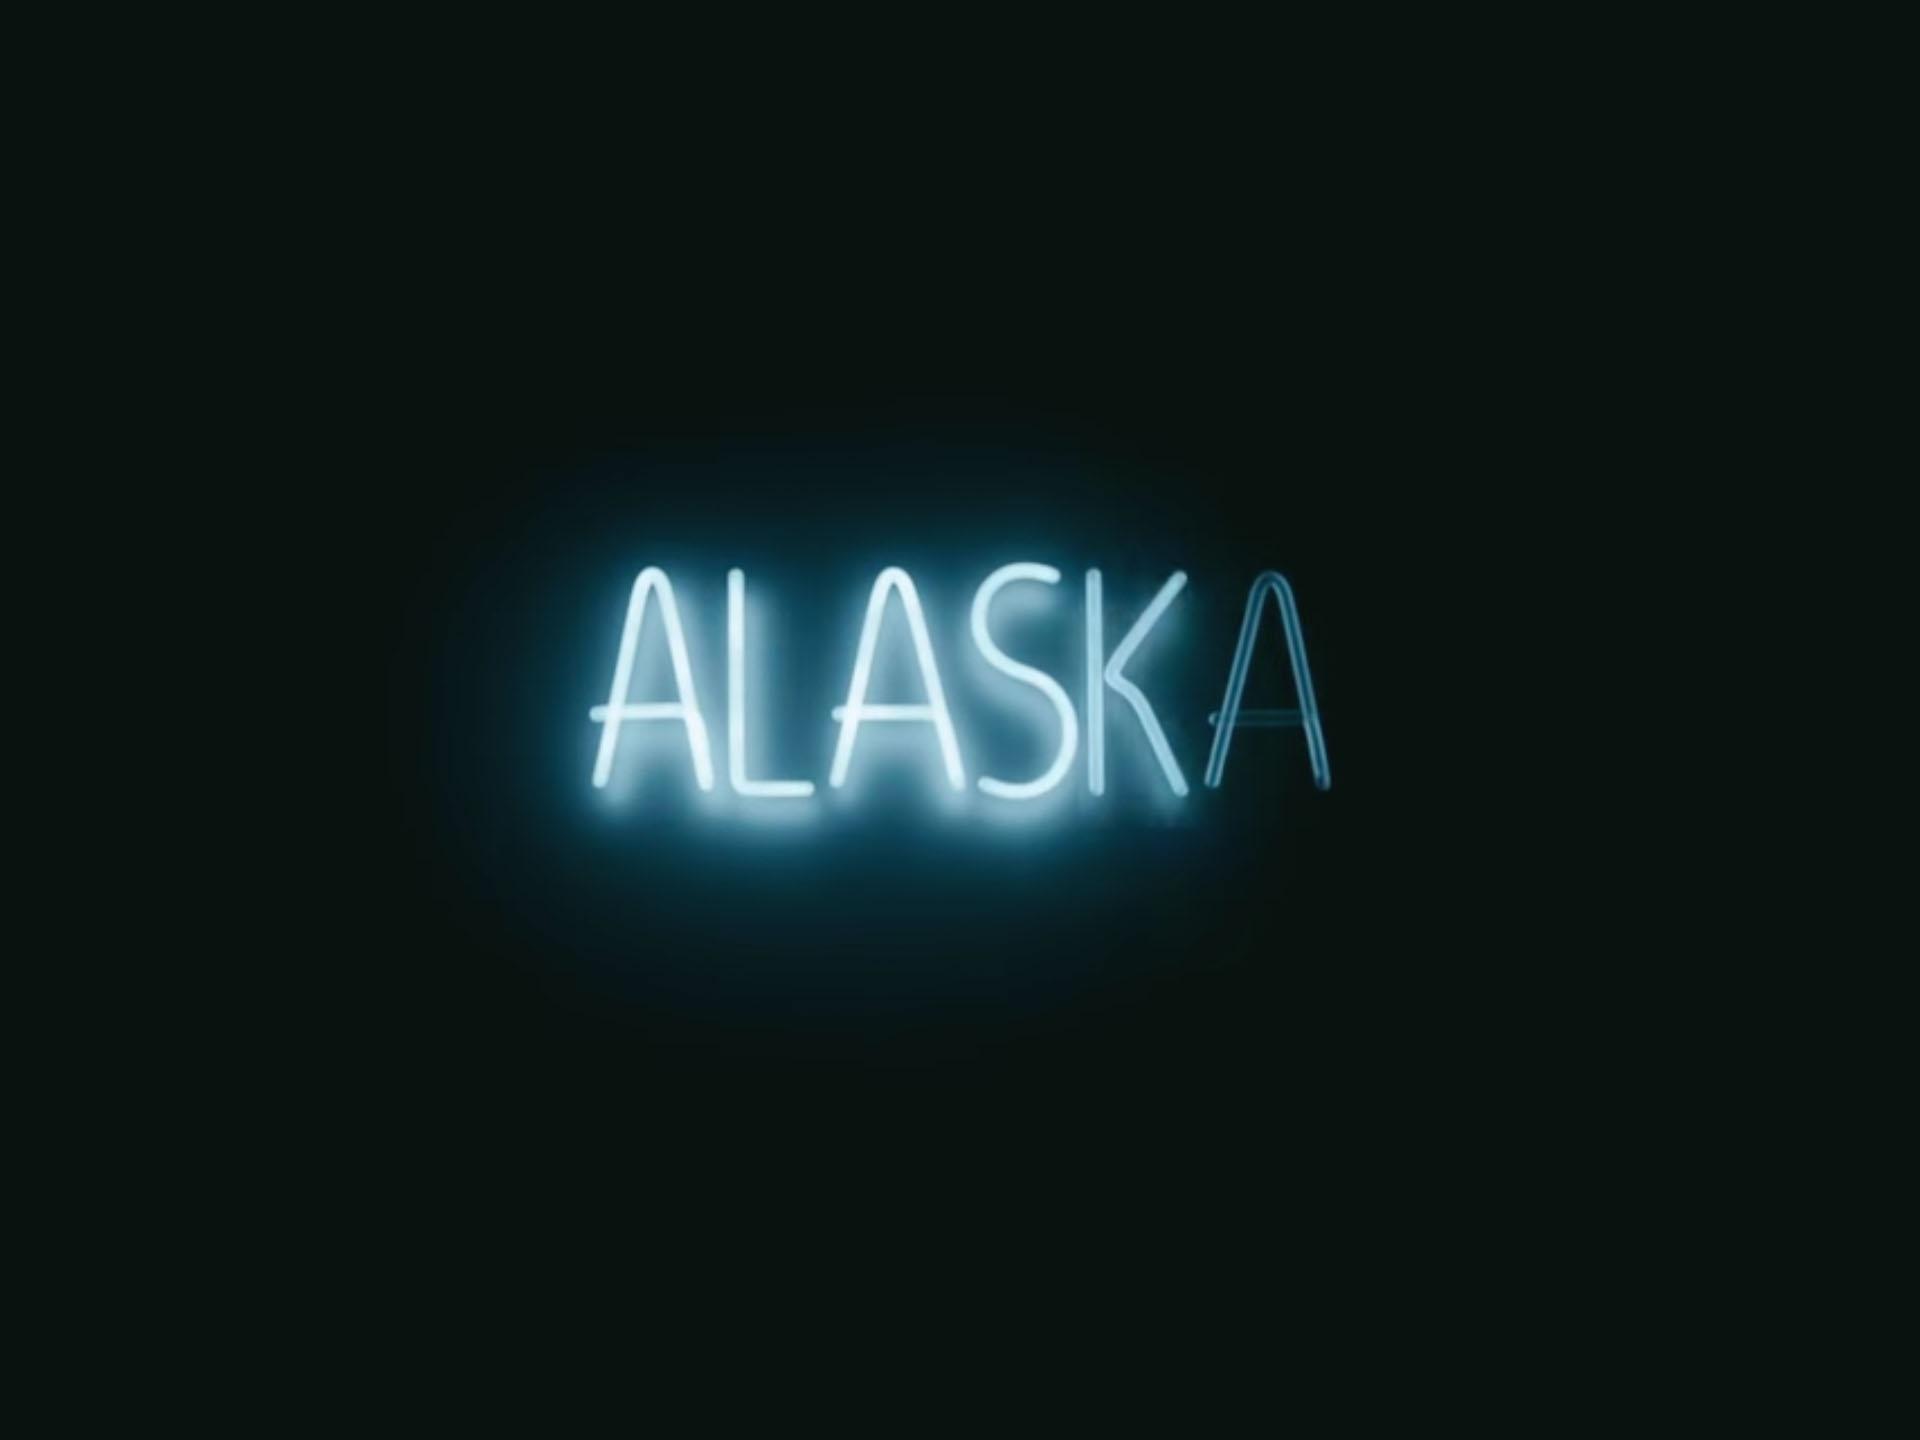 Alaska-E